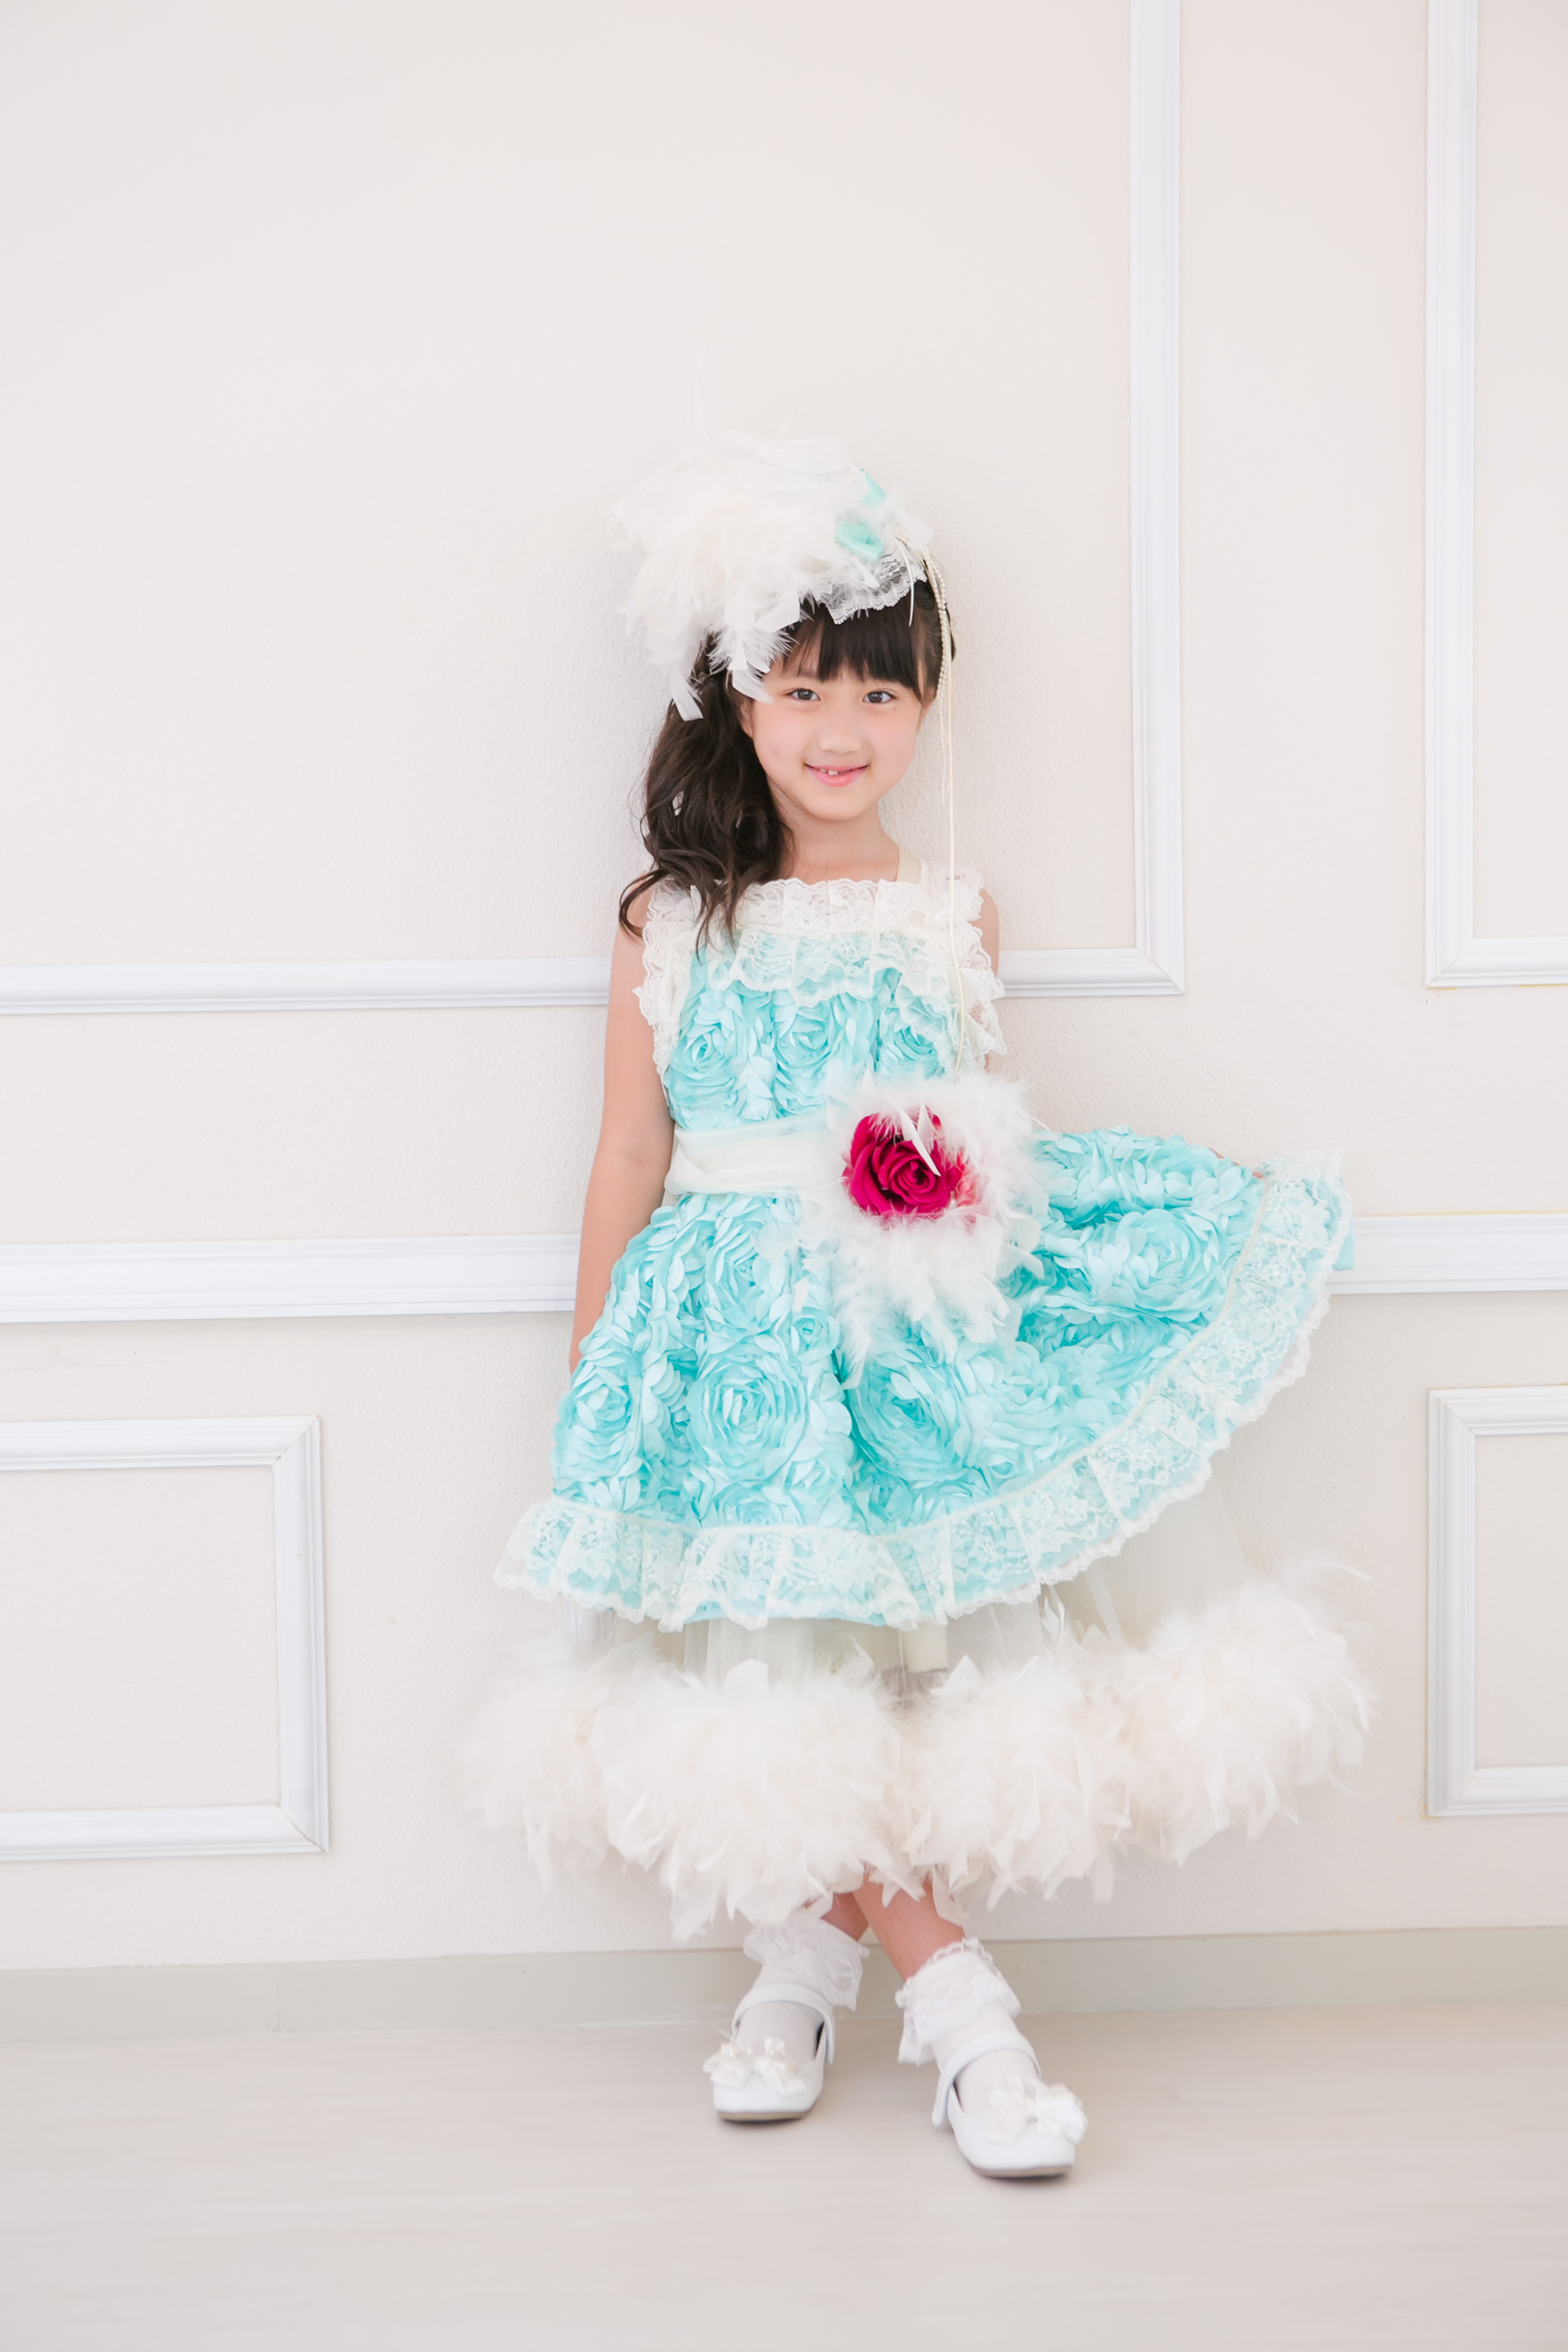 mia luxury micia my dress  otoha